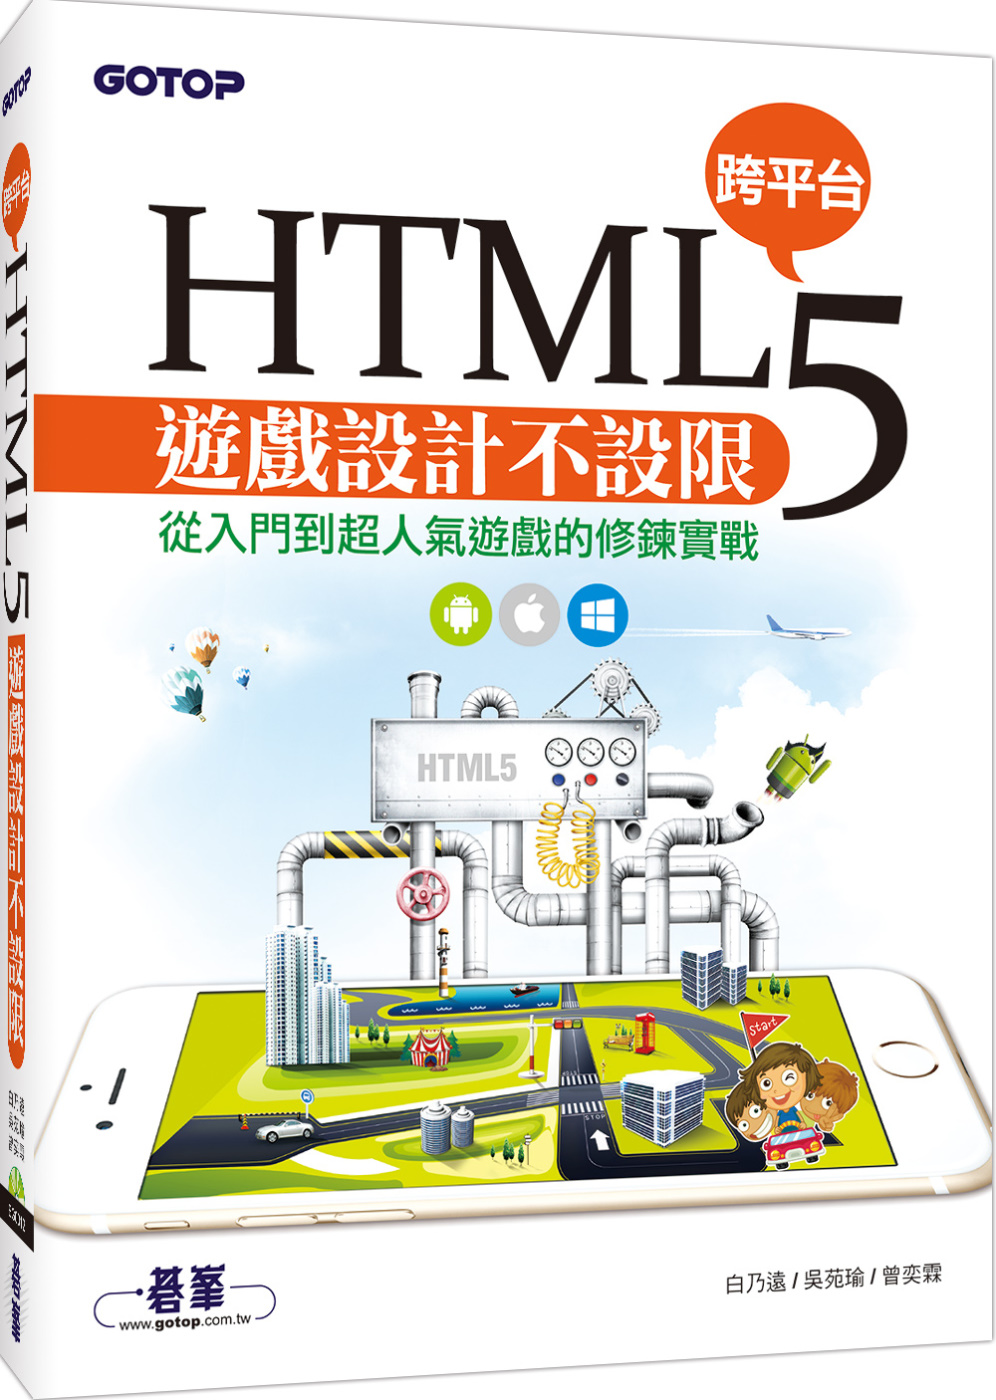 HTML5跨平台遊戲設計不設限:從入門到超人氣遊戲的修鍊實戰